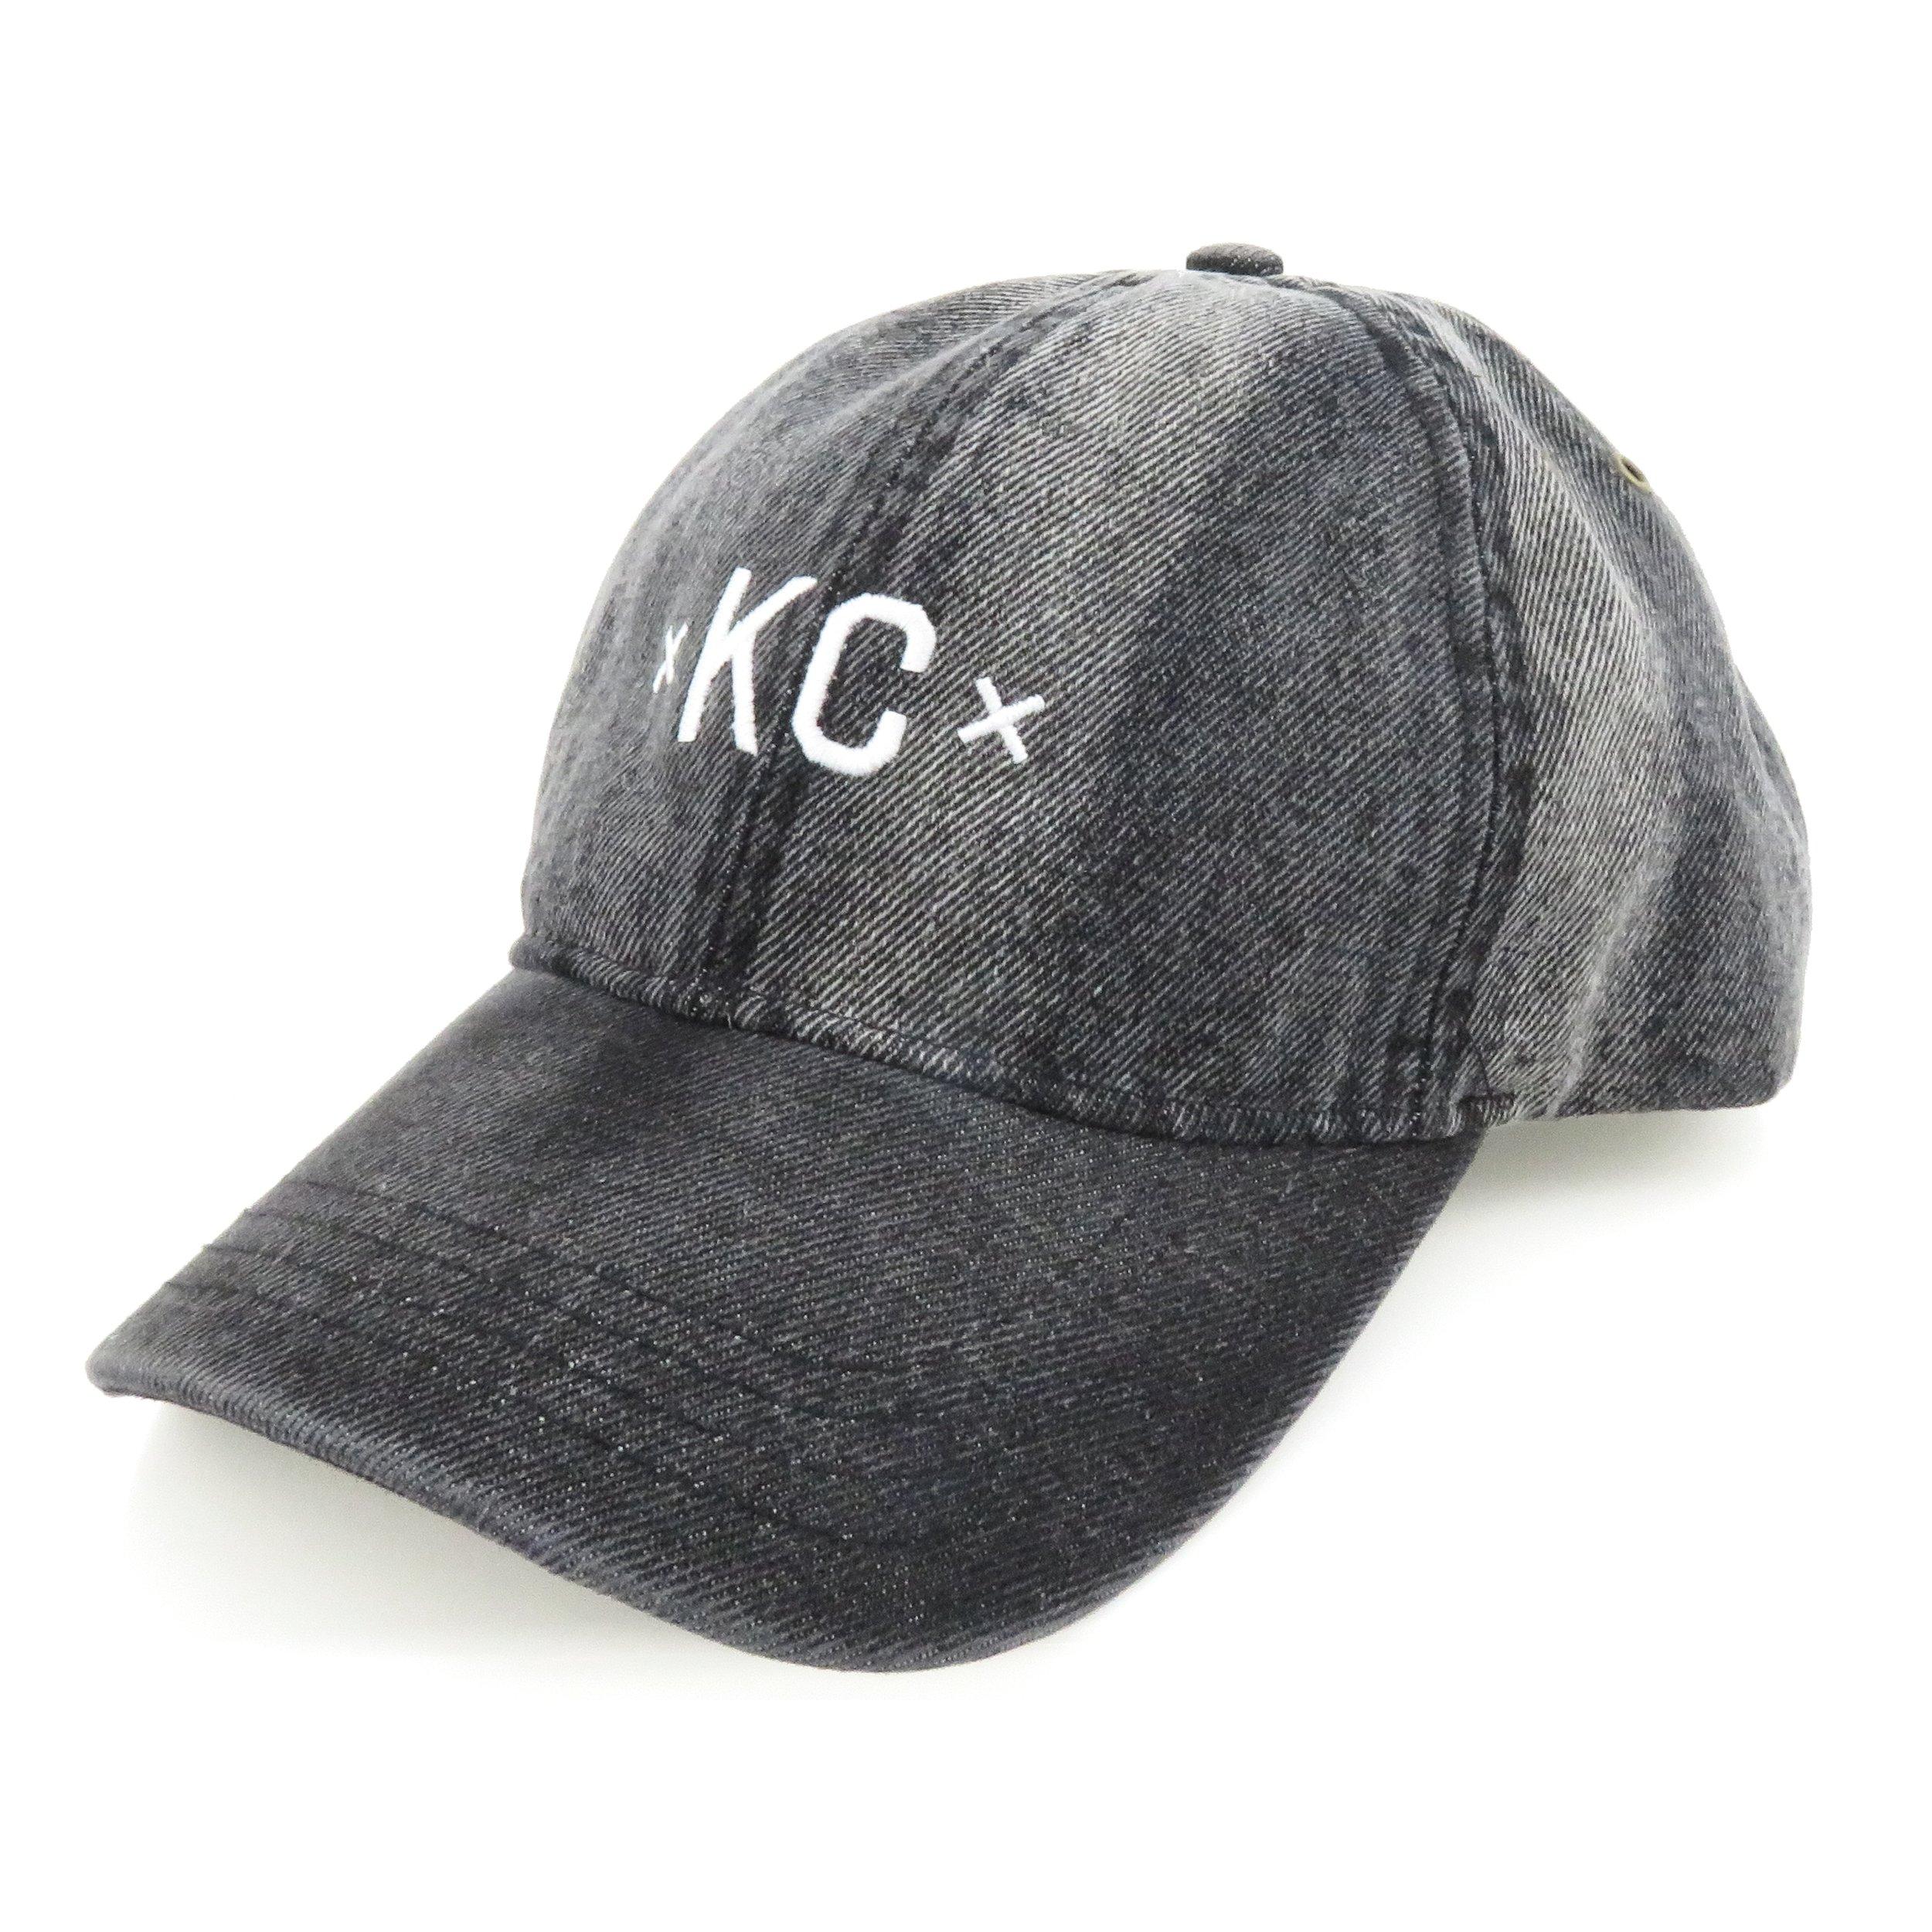 b8588a3cc12 Made Urban Apparel KC Dad Hat - Black Denim.  MadeUrban KCBaseballHat BlackDenim.jpg